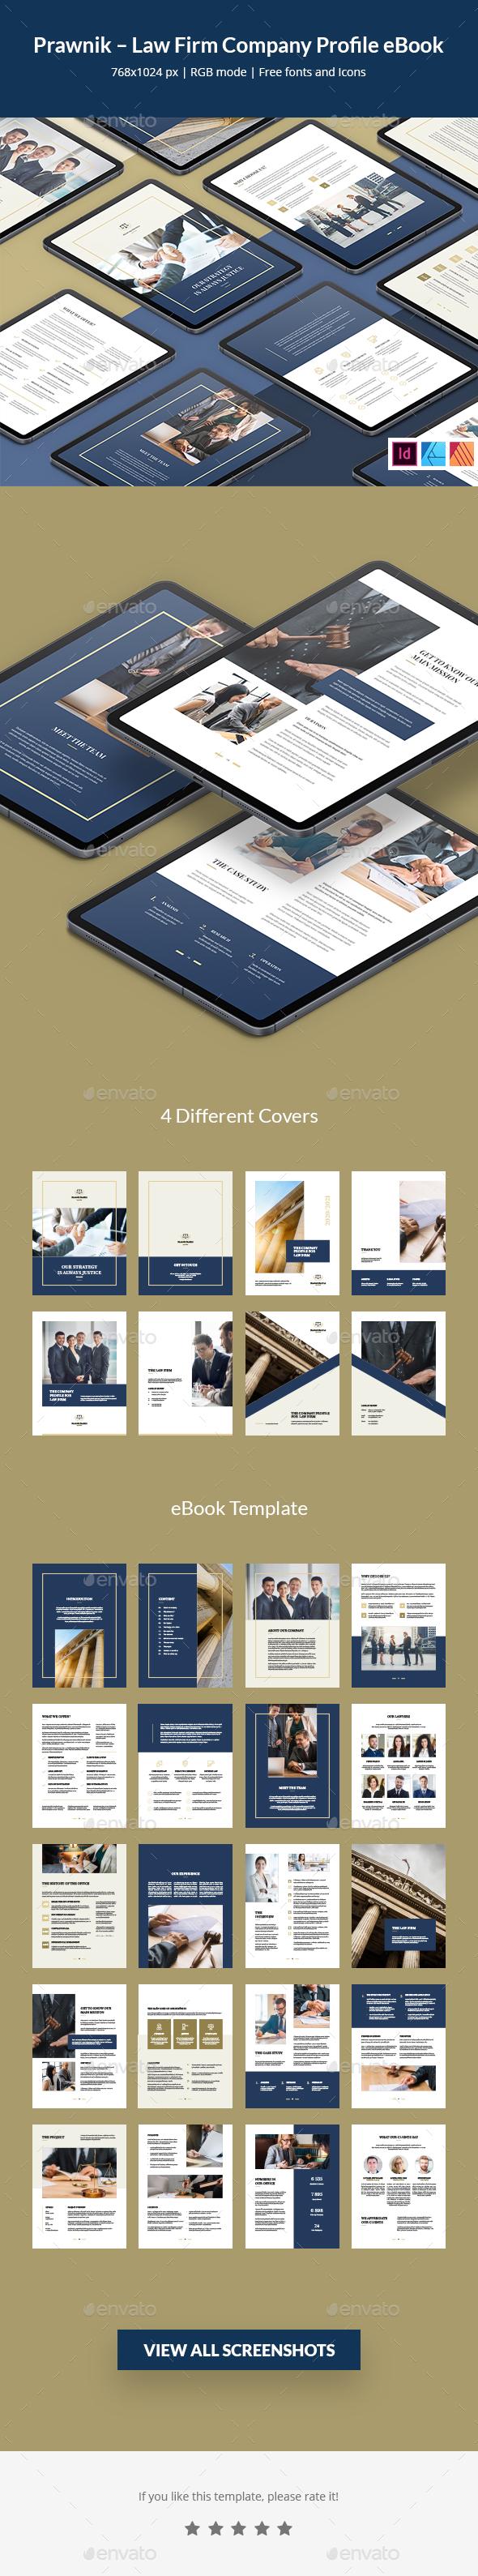 Prawnik – Law Firm Company Profile eBook